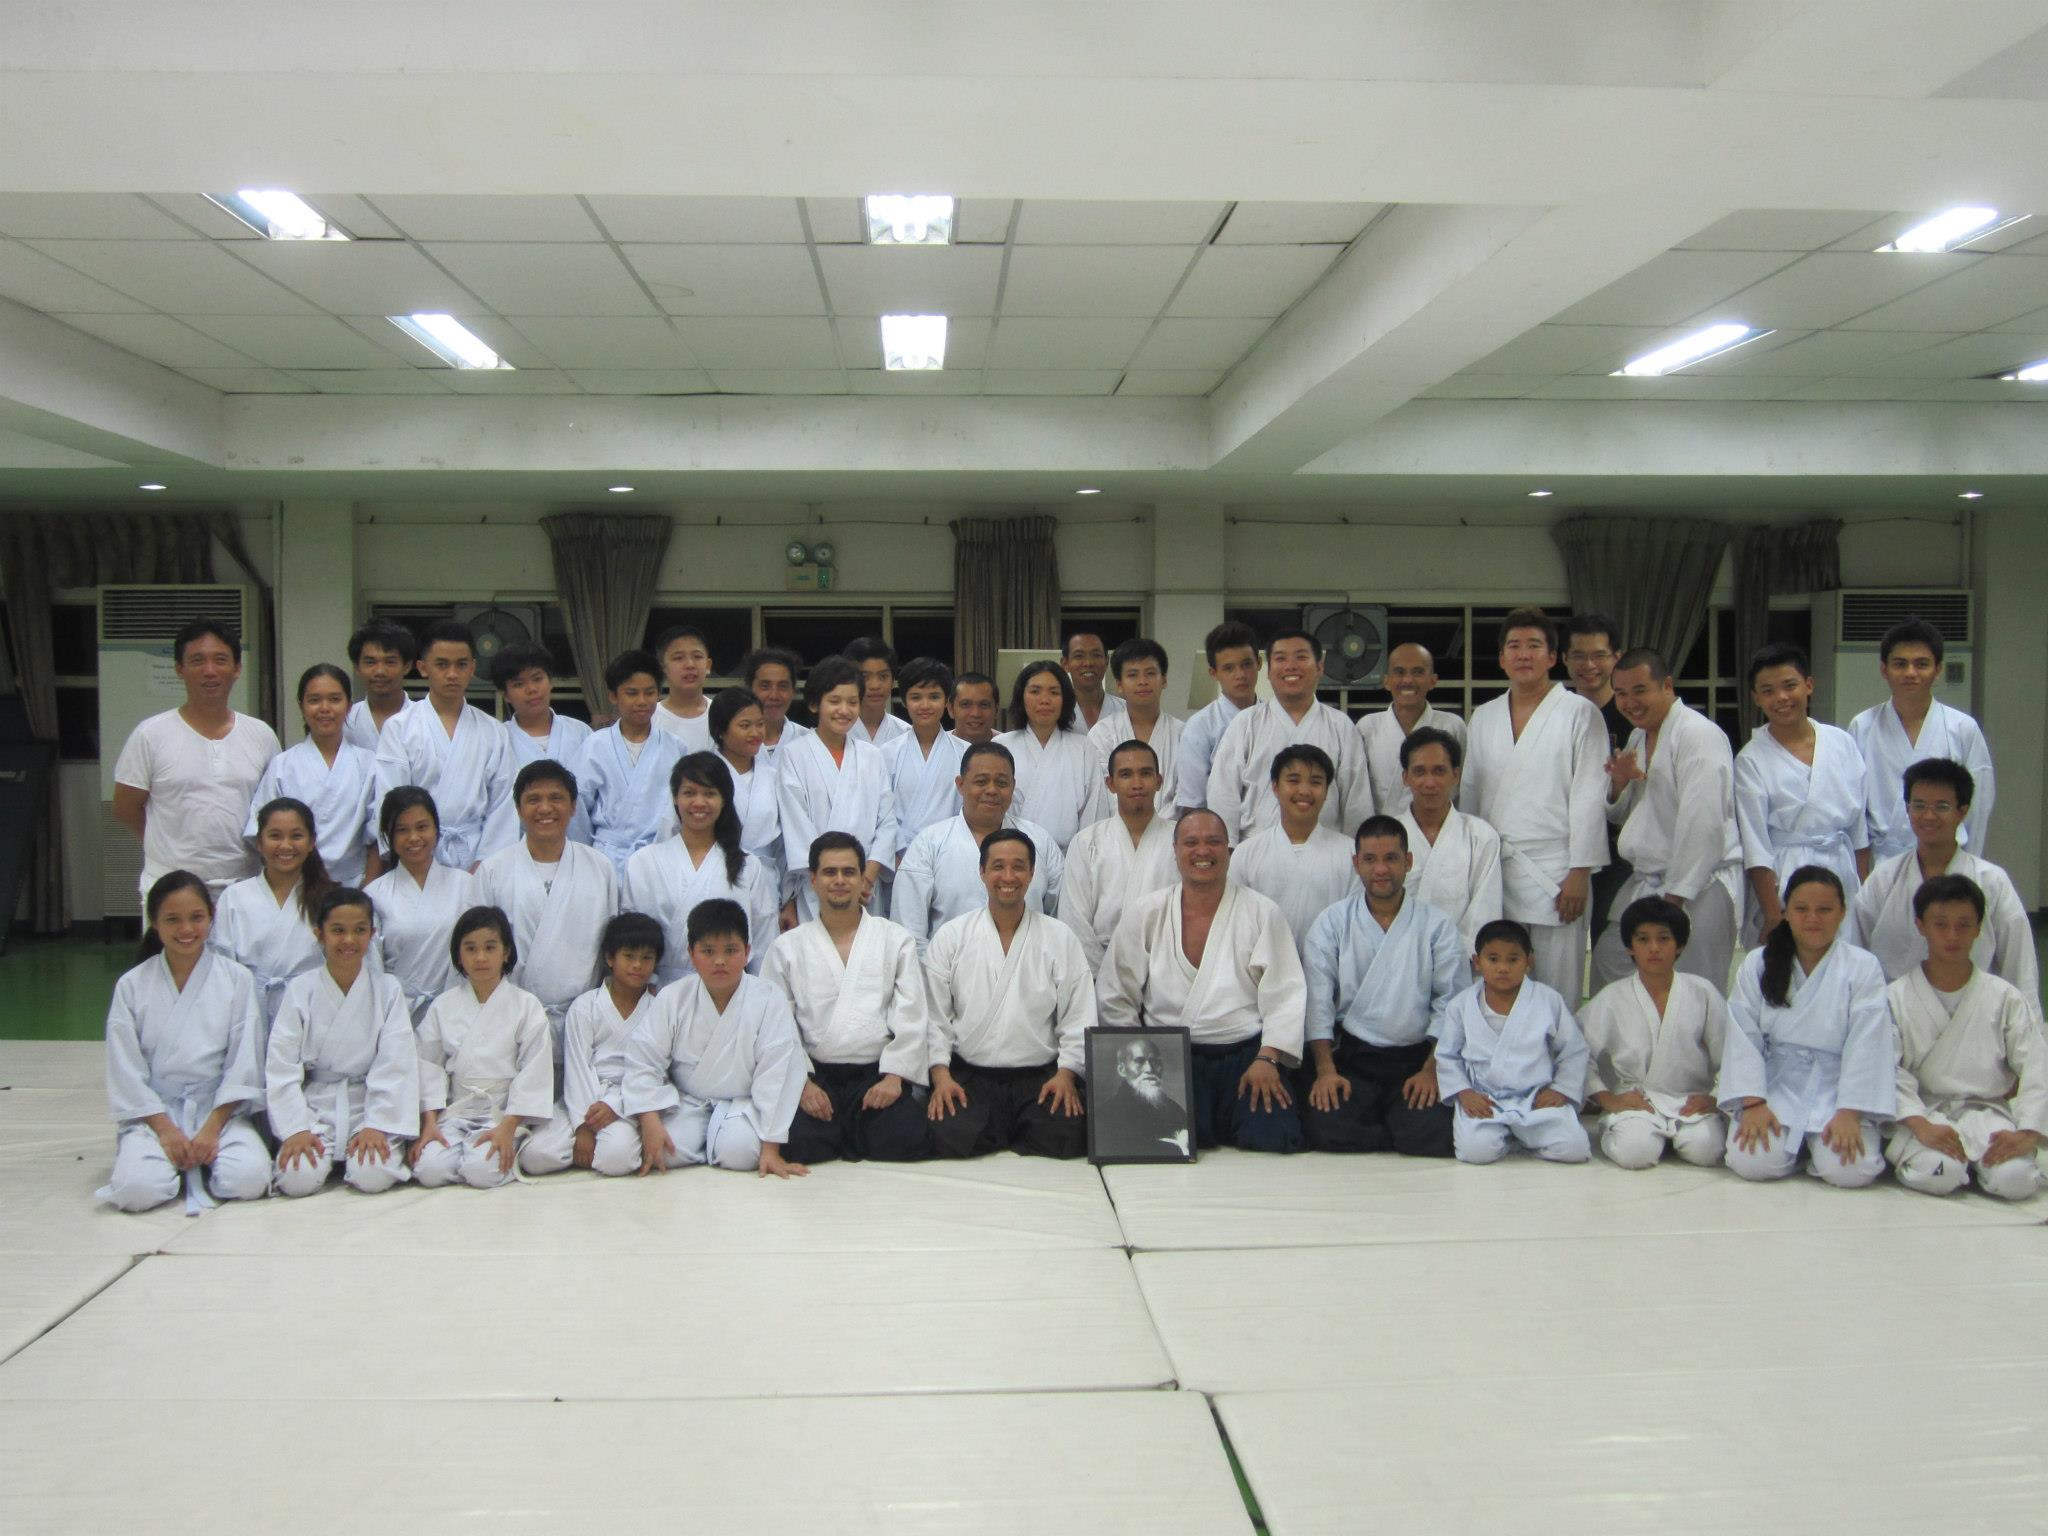 Sacred Heart Aikido Center Cebu – 8th Anniversary Celebration